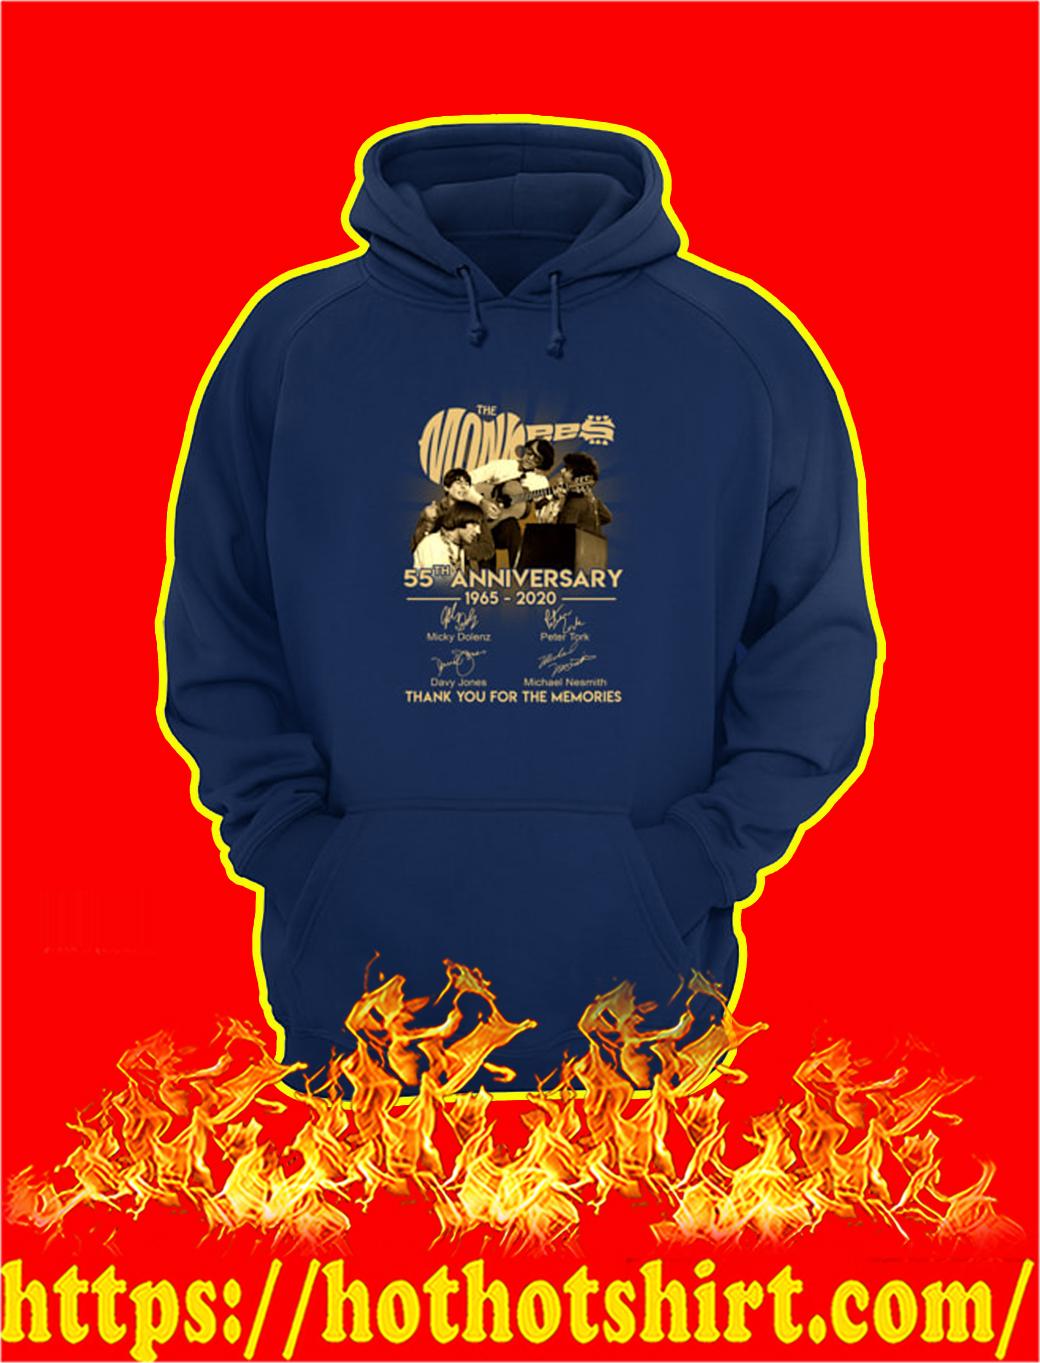 The Monkees 55th Anniversary 1965 2020 hoodie